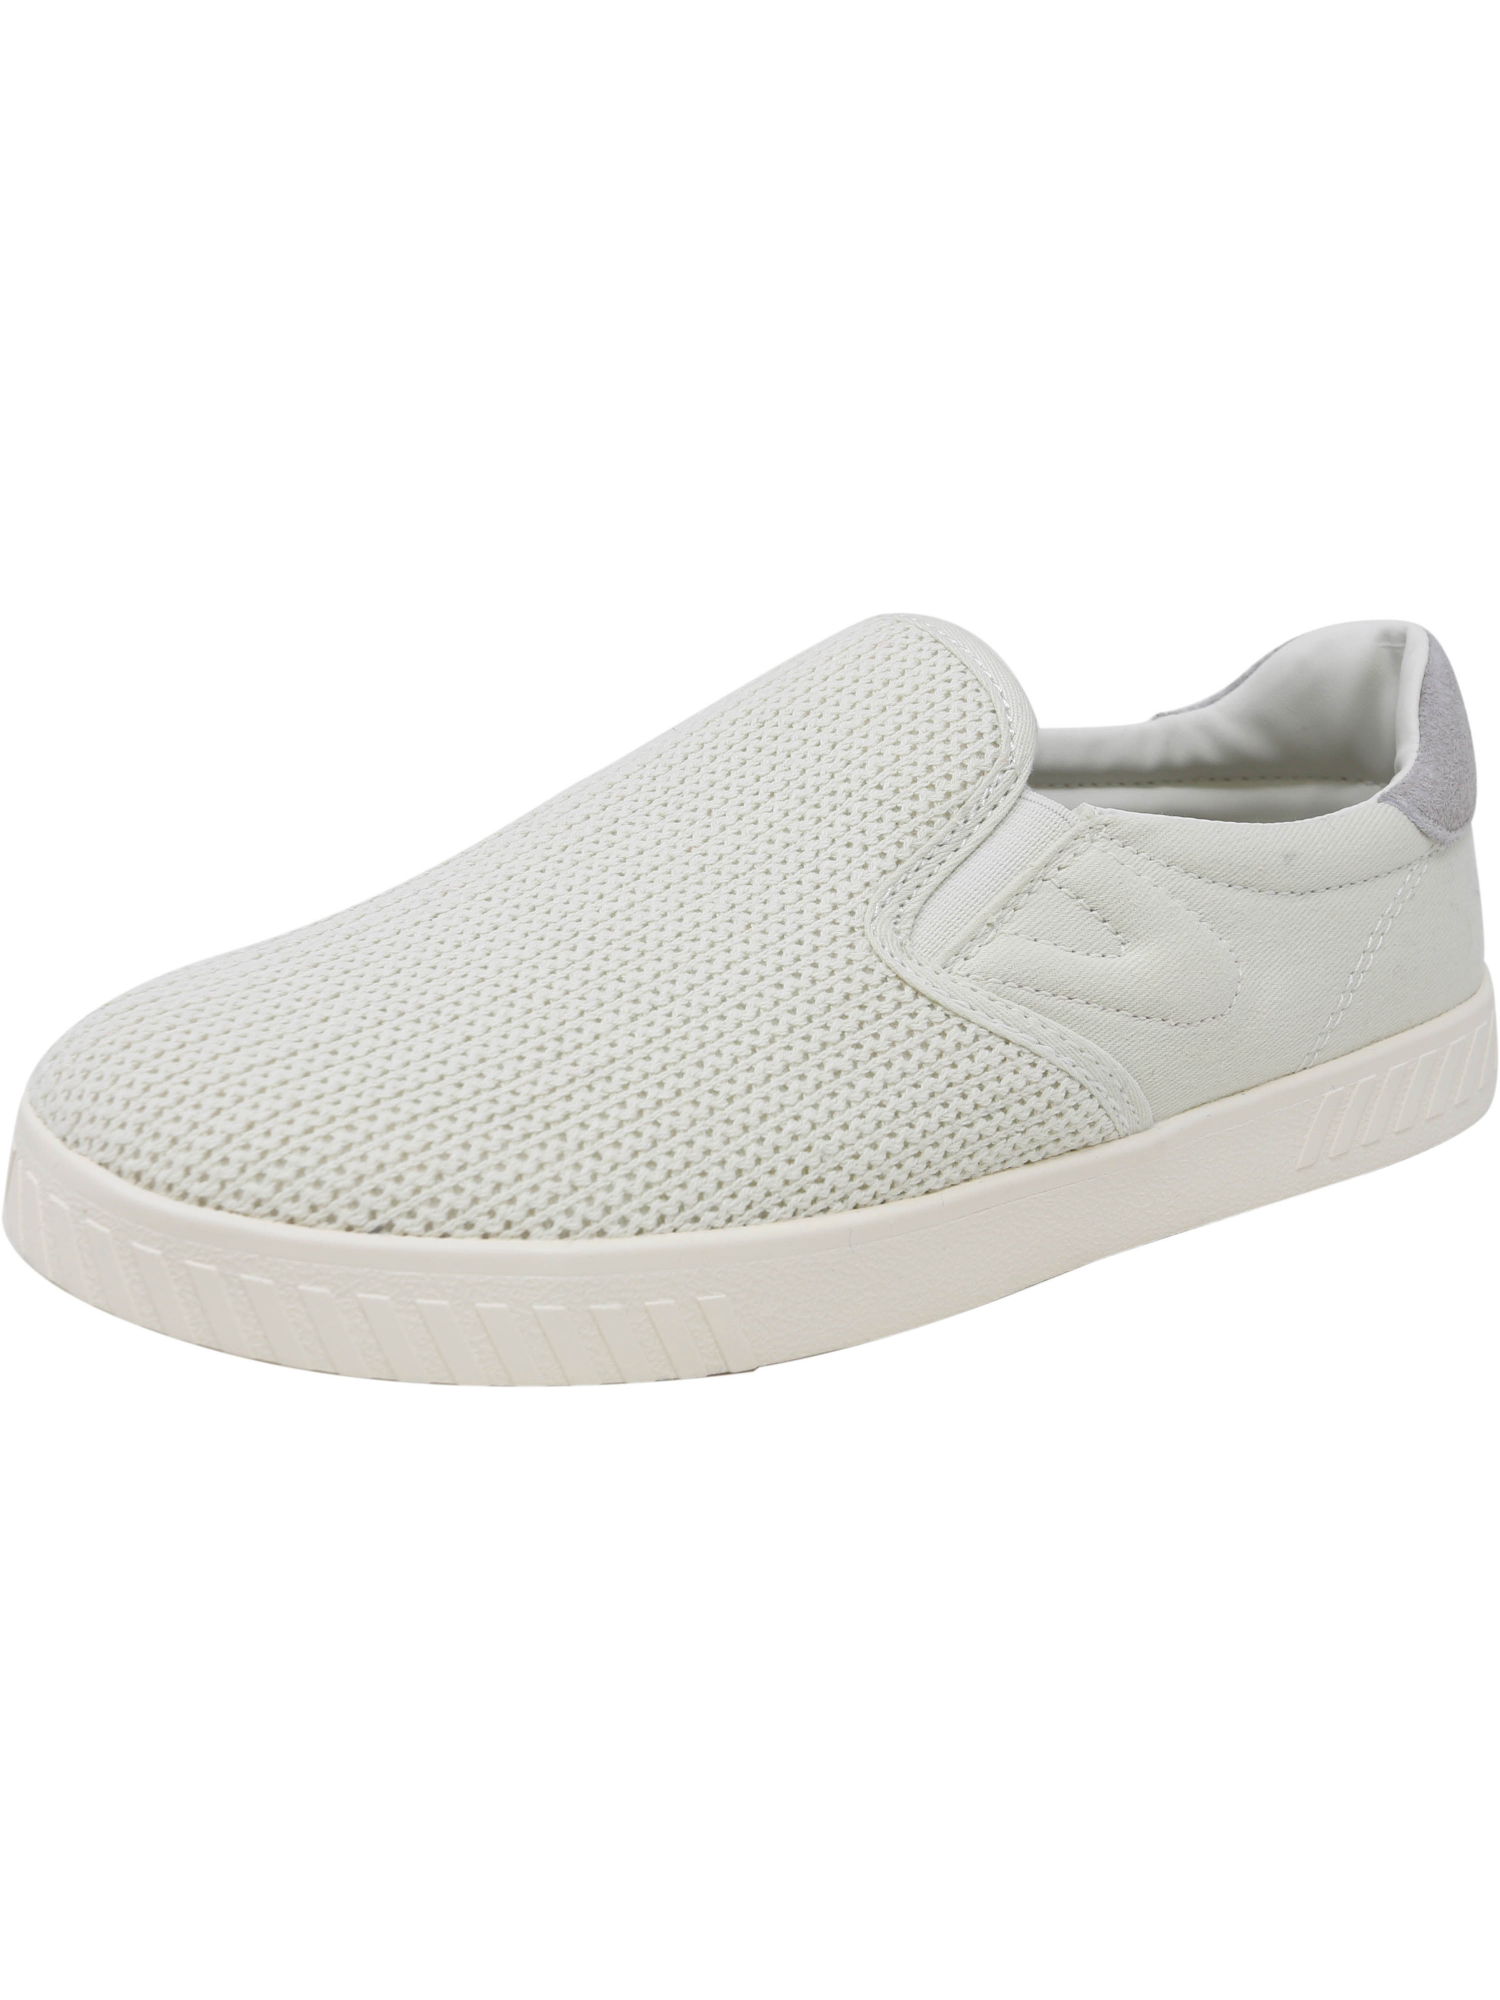 Tretorn-Femmes-Cruz-tissu-aux-chevilles-Haute-Slip-Chaussures-en miniature 15